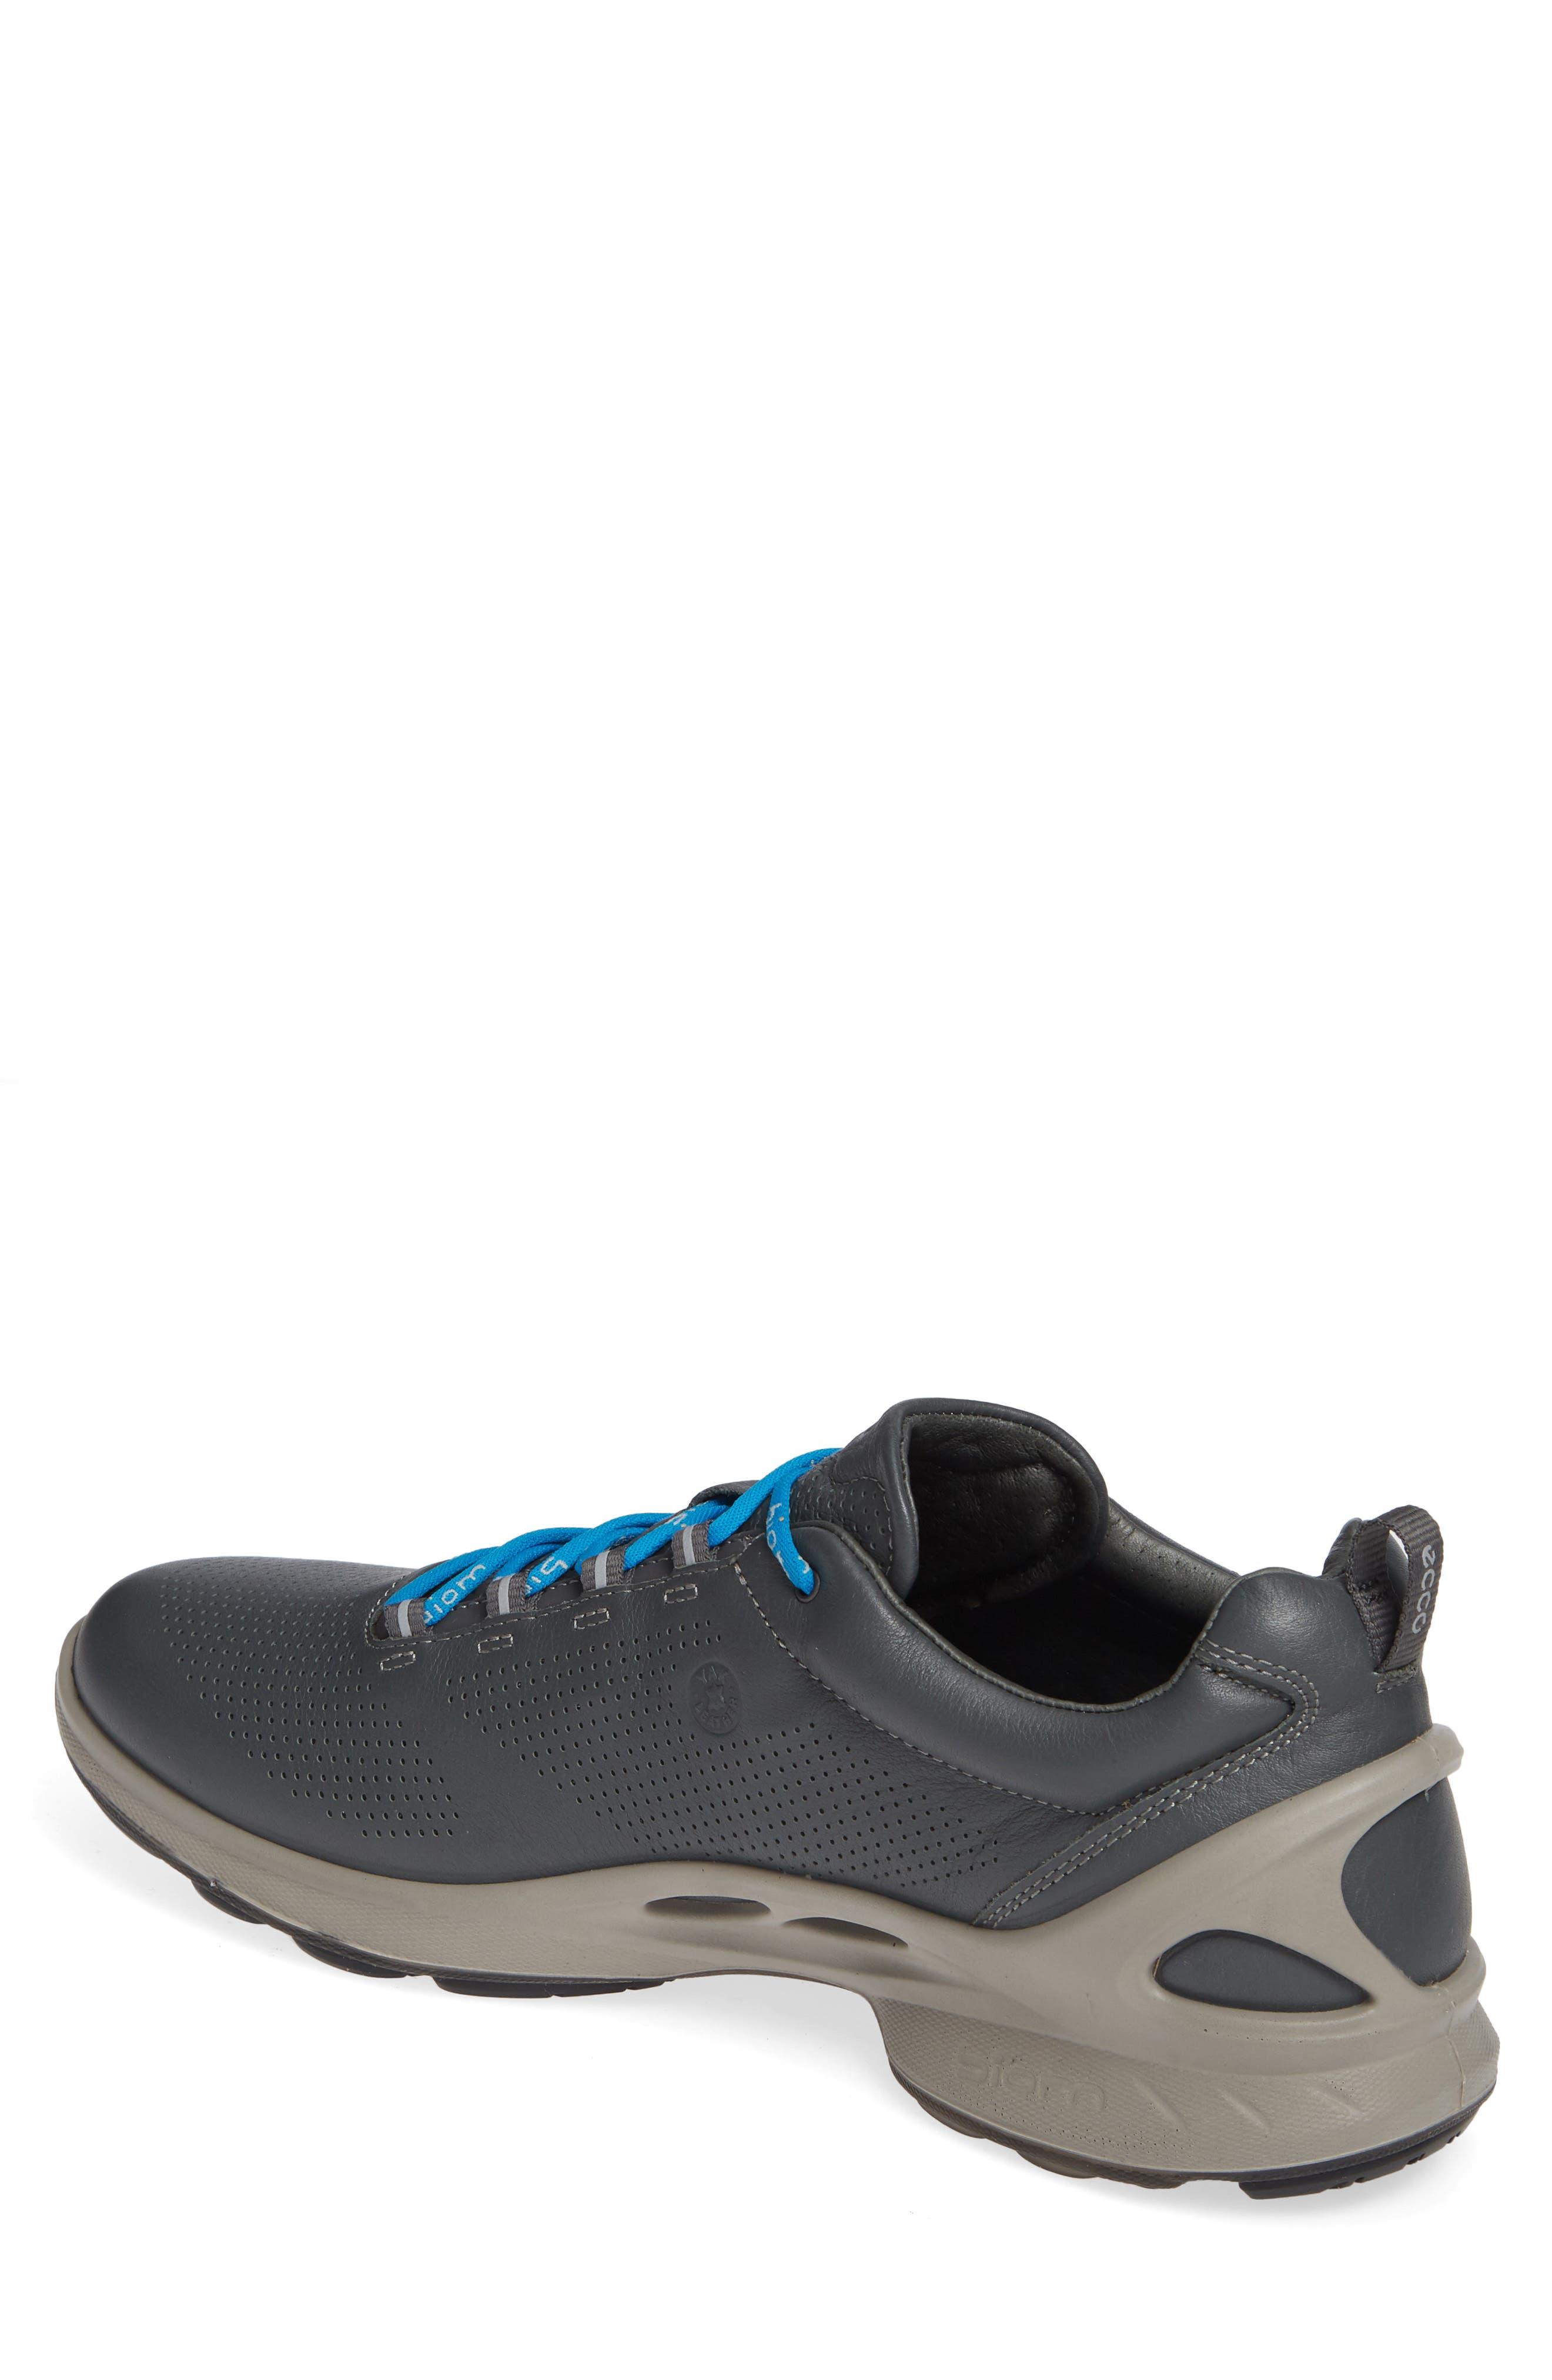 'BIOM Fjuel' Sneaker,                             Alternate thumbnail 2, color,                             DARK SHADOW LEATHER